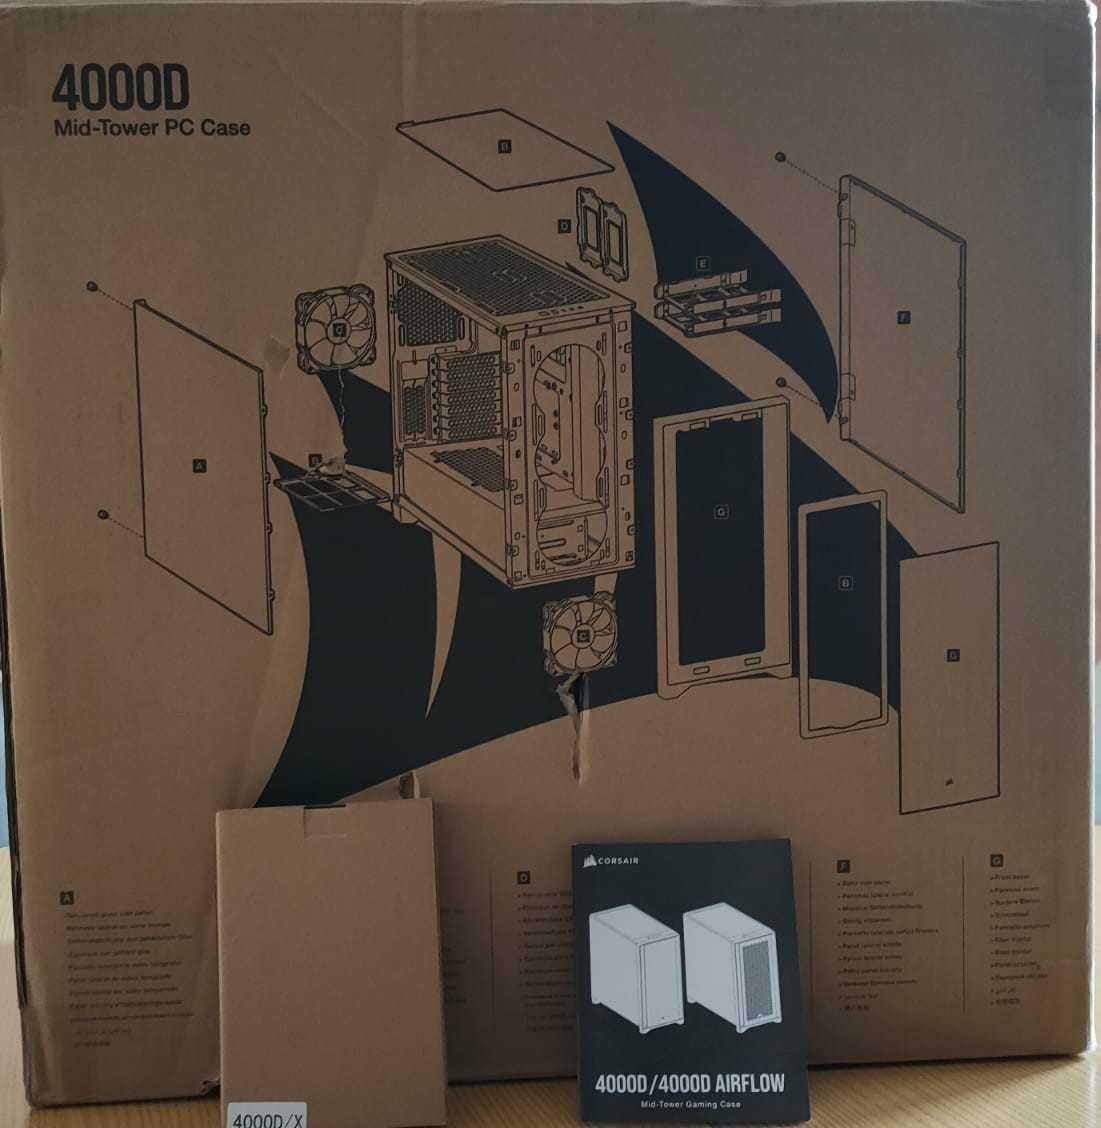 Recensione Corsair 4000D: case da poca spesa e tanta resa